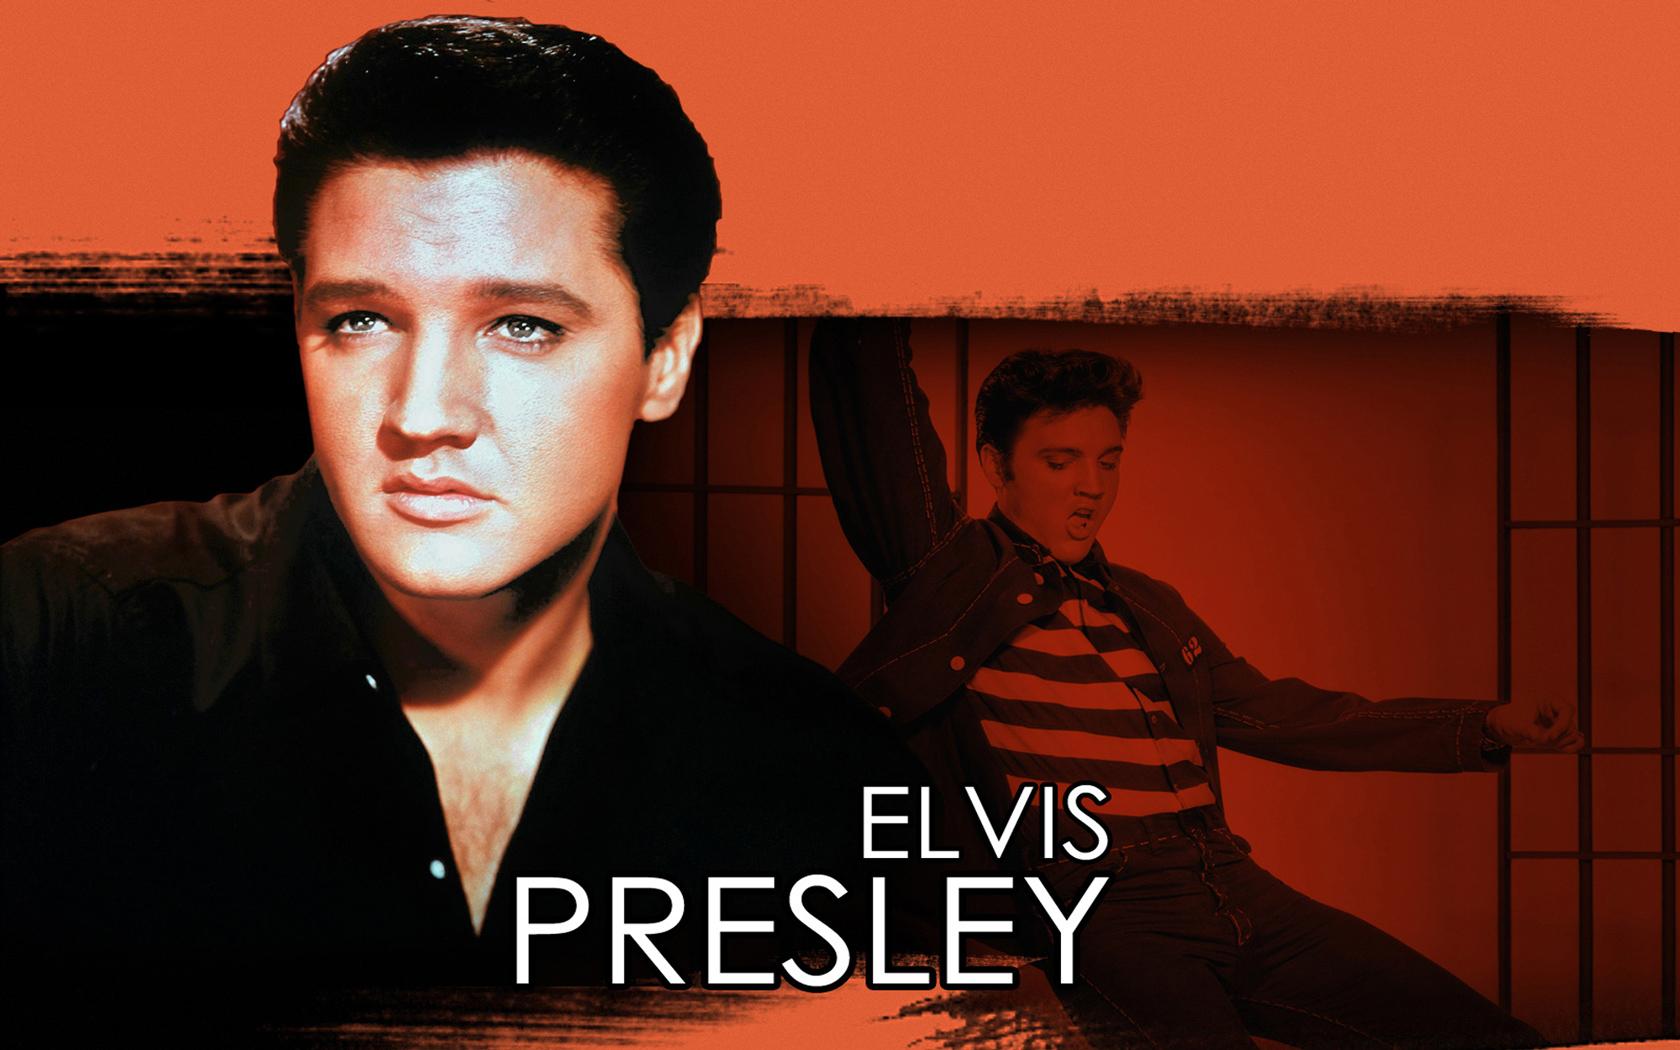 Free download Elvis Presley Day computer desktop wallpapers pictures images  [1680x1050] for your Desktop, Mobile & Tablet | Explore 49+ Elvis Presley  Wallpaper 1680x1050 Free | Elvis Presley Wallpaper 1680x1050 Free, Elvis